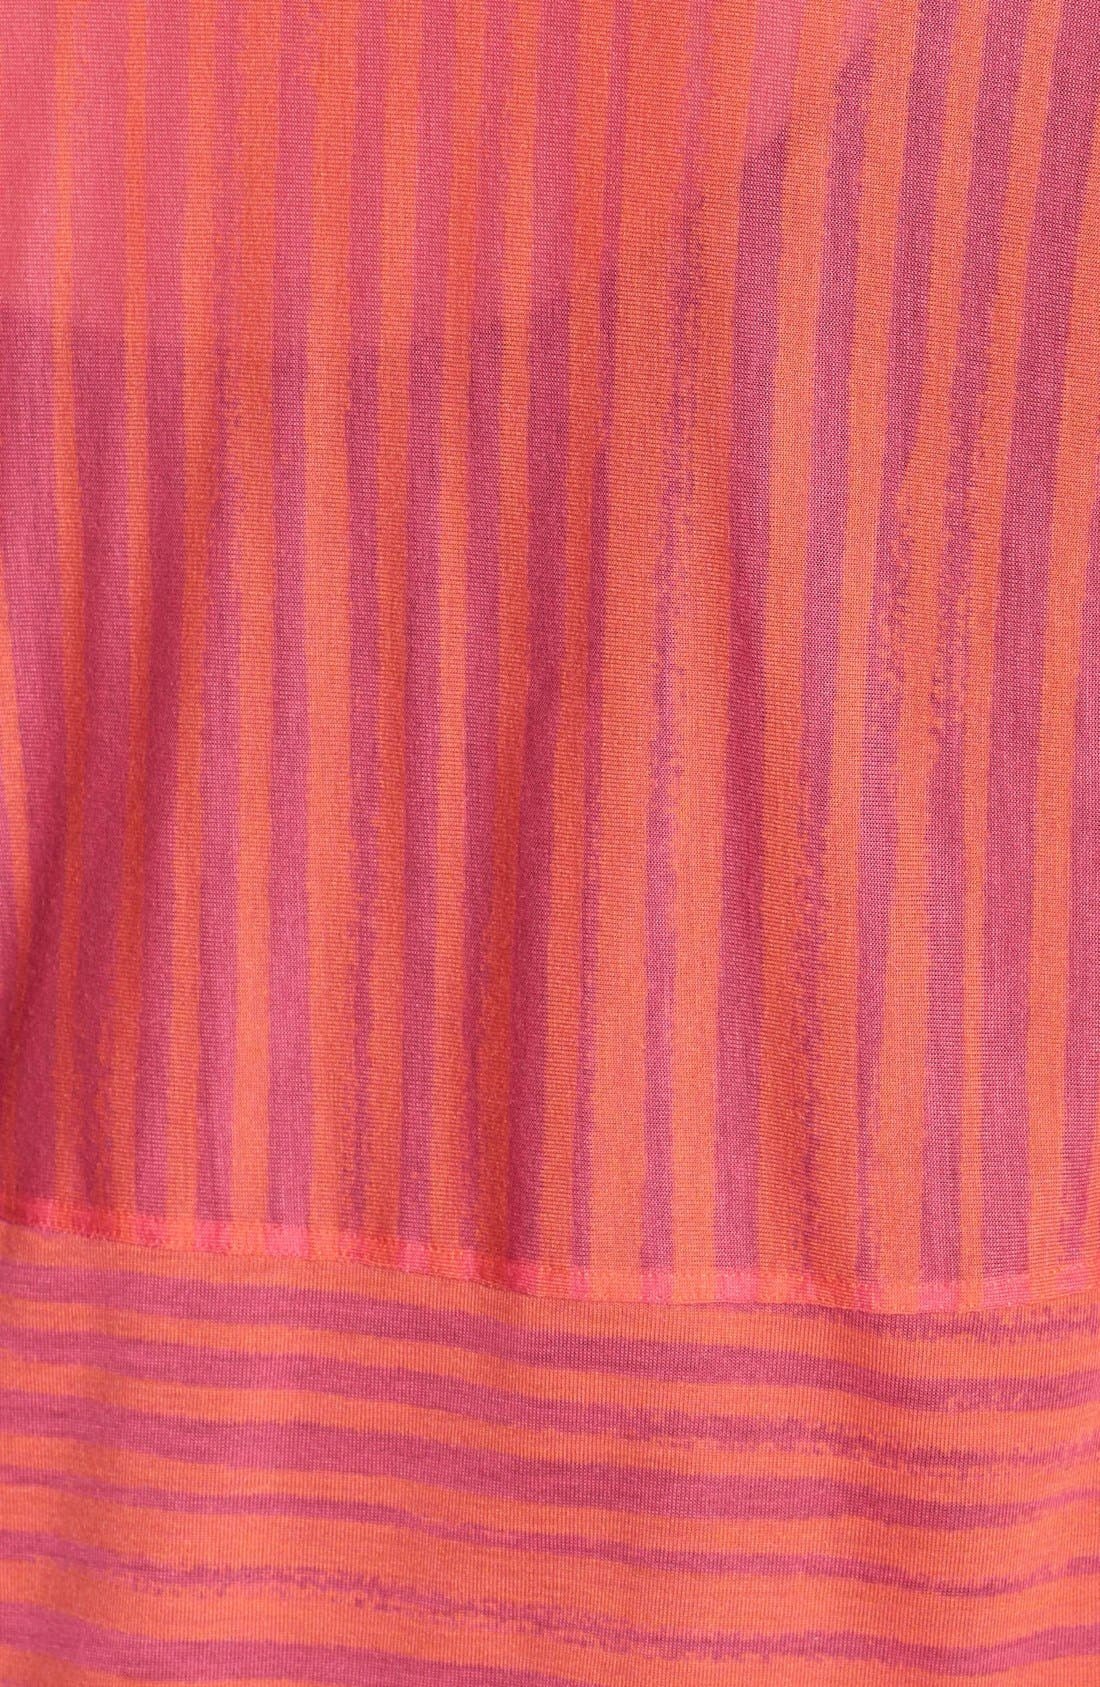 Alternate Image 3  - Moving Comfort 'Flaunt It' Wrap Cardigan (Plus Size)